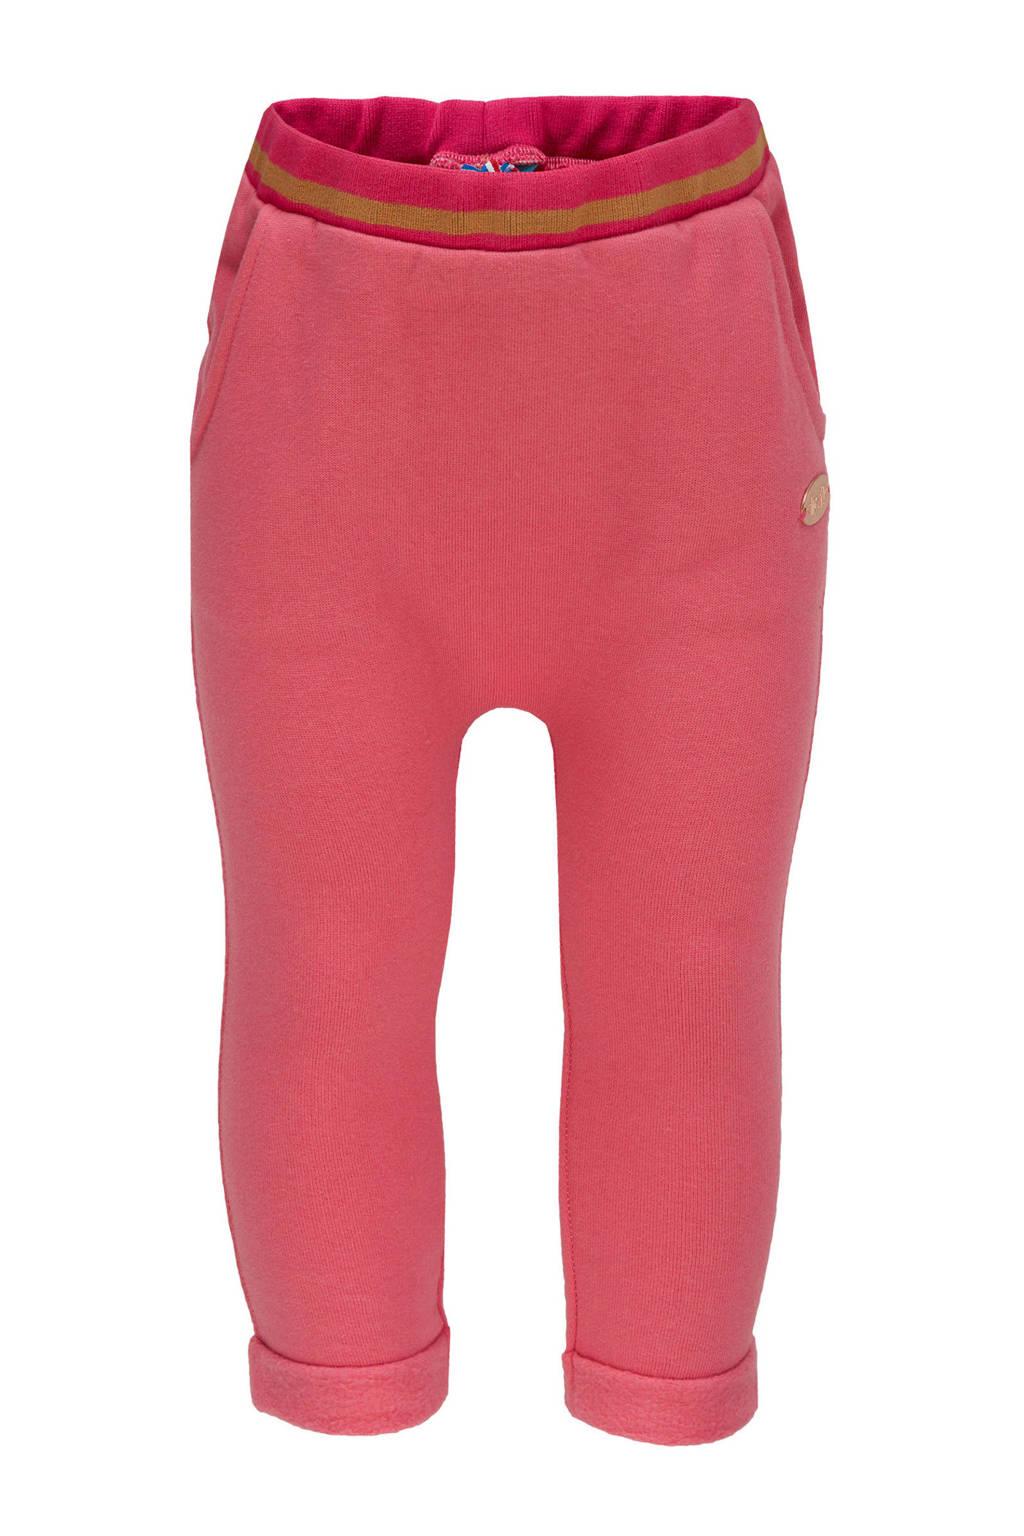 lief! sweatpants roze, Roze